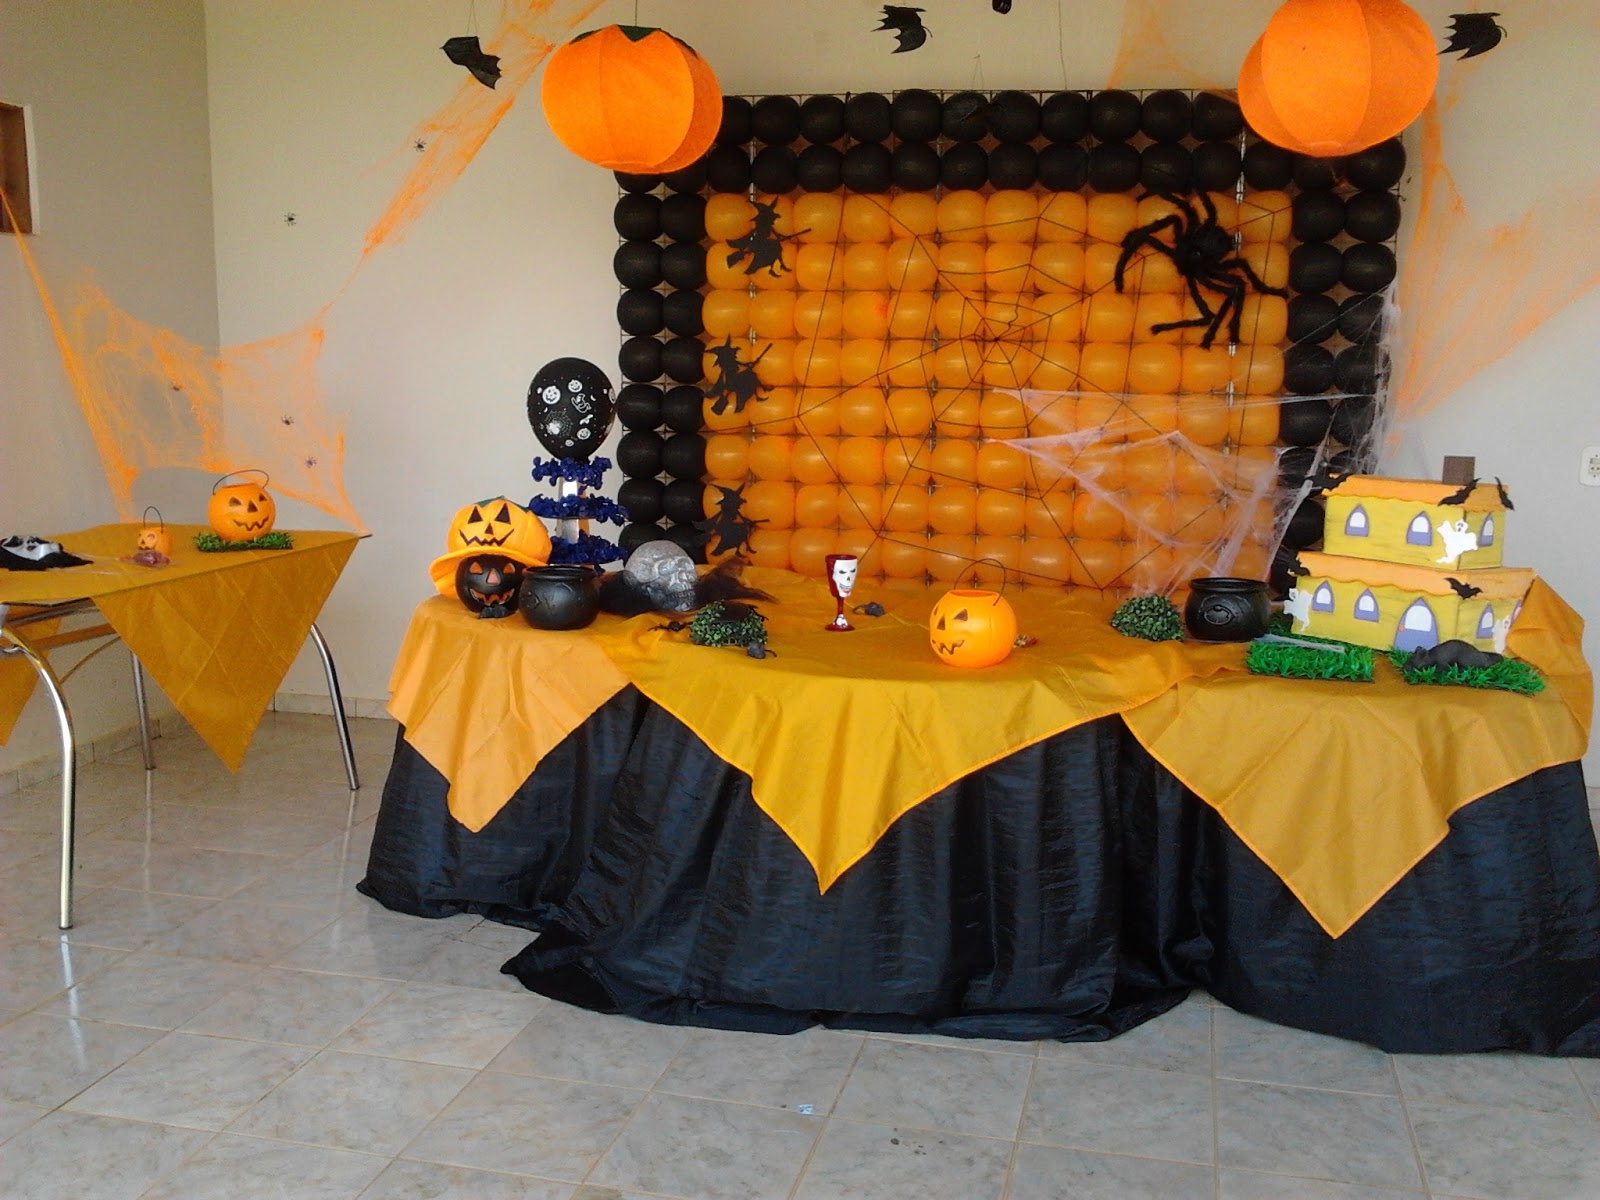 Kit Decoracao Sala De Aula ~  as tesourinhas para que cortem # decoracao de halloween sala de aula